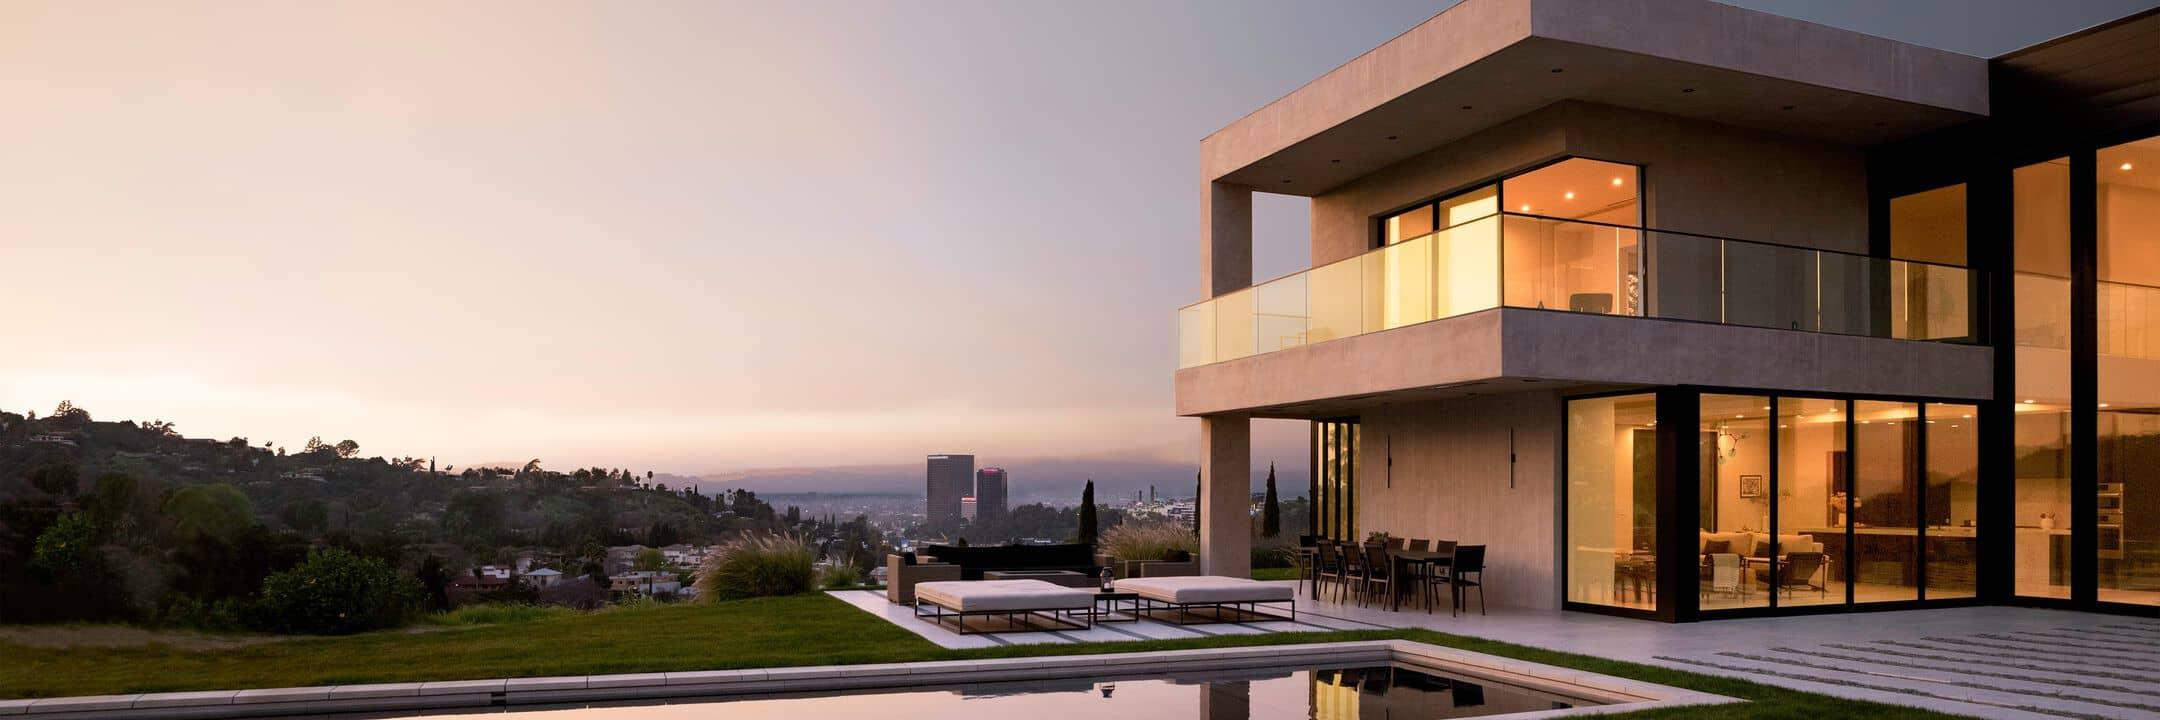 Luxury rentals in Los Angeles